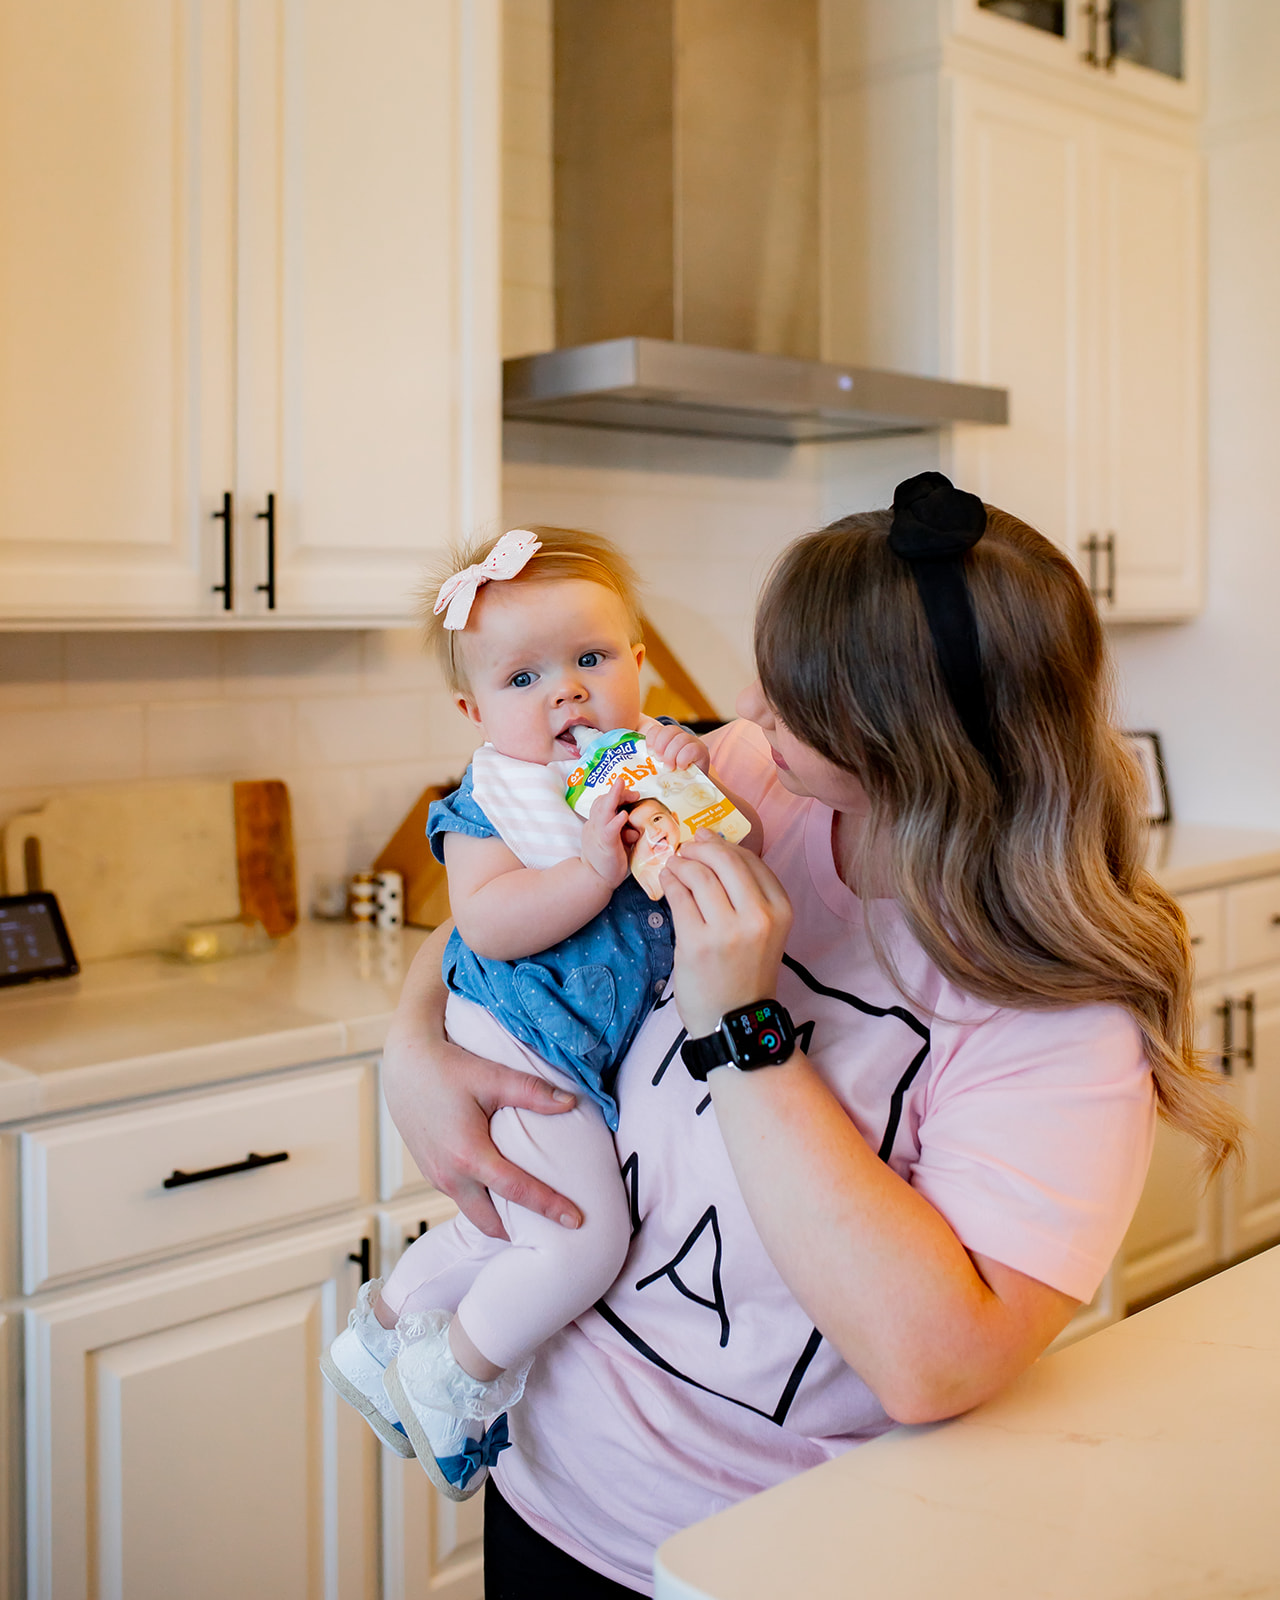 When her daughter ate a Stonyfield yogurt bag, her mother held her baby girl.